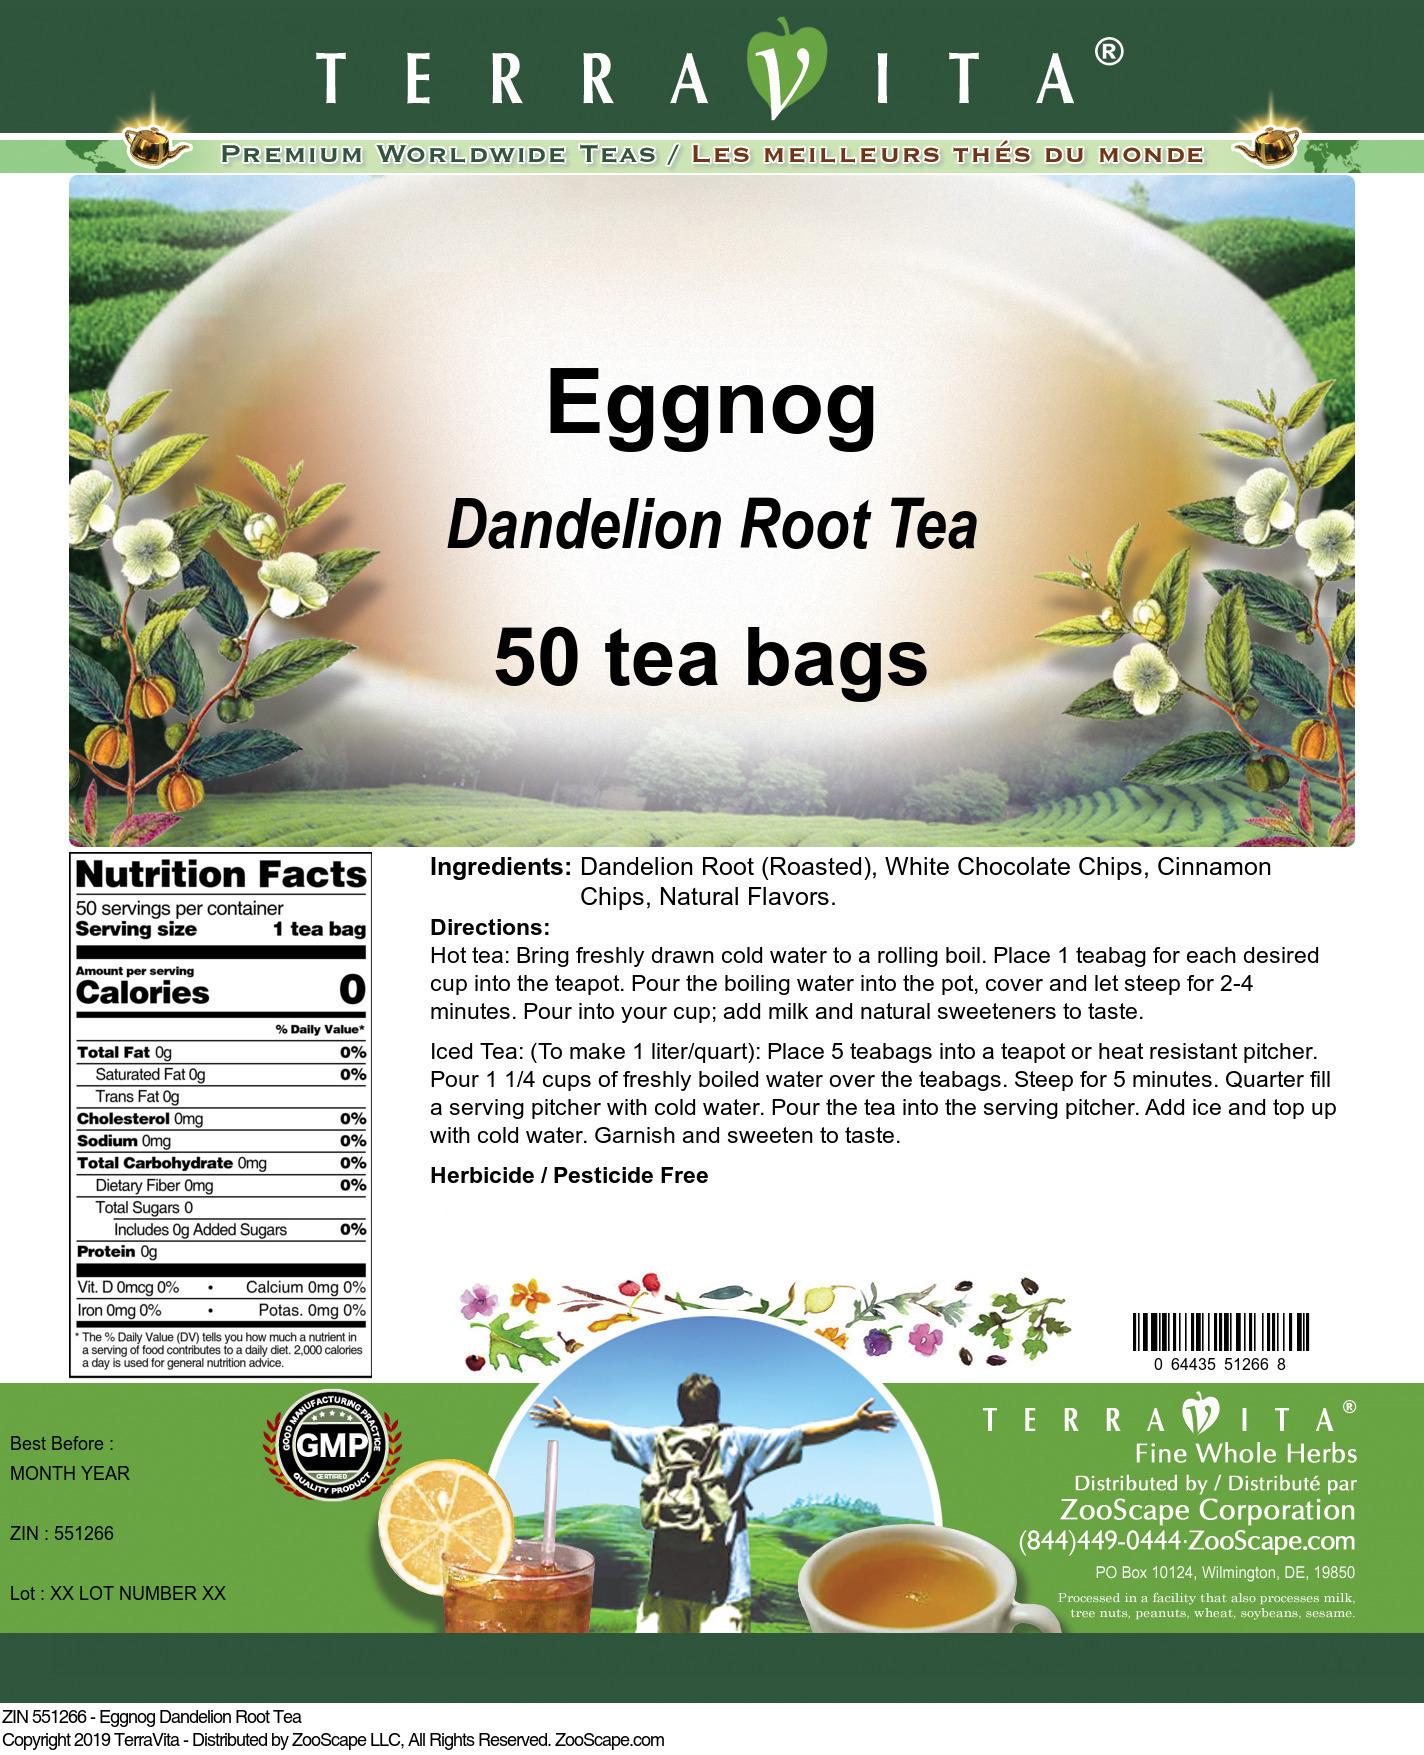 Eggnog Dandelion Root Tea